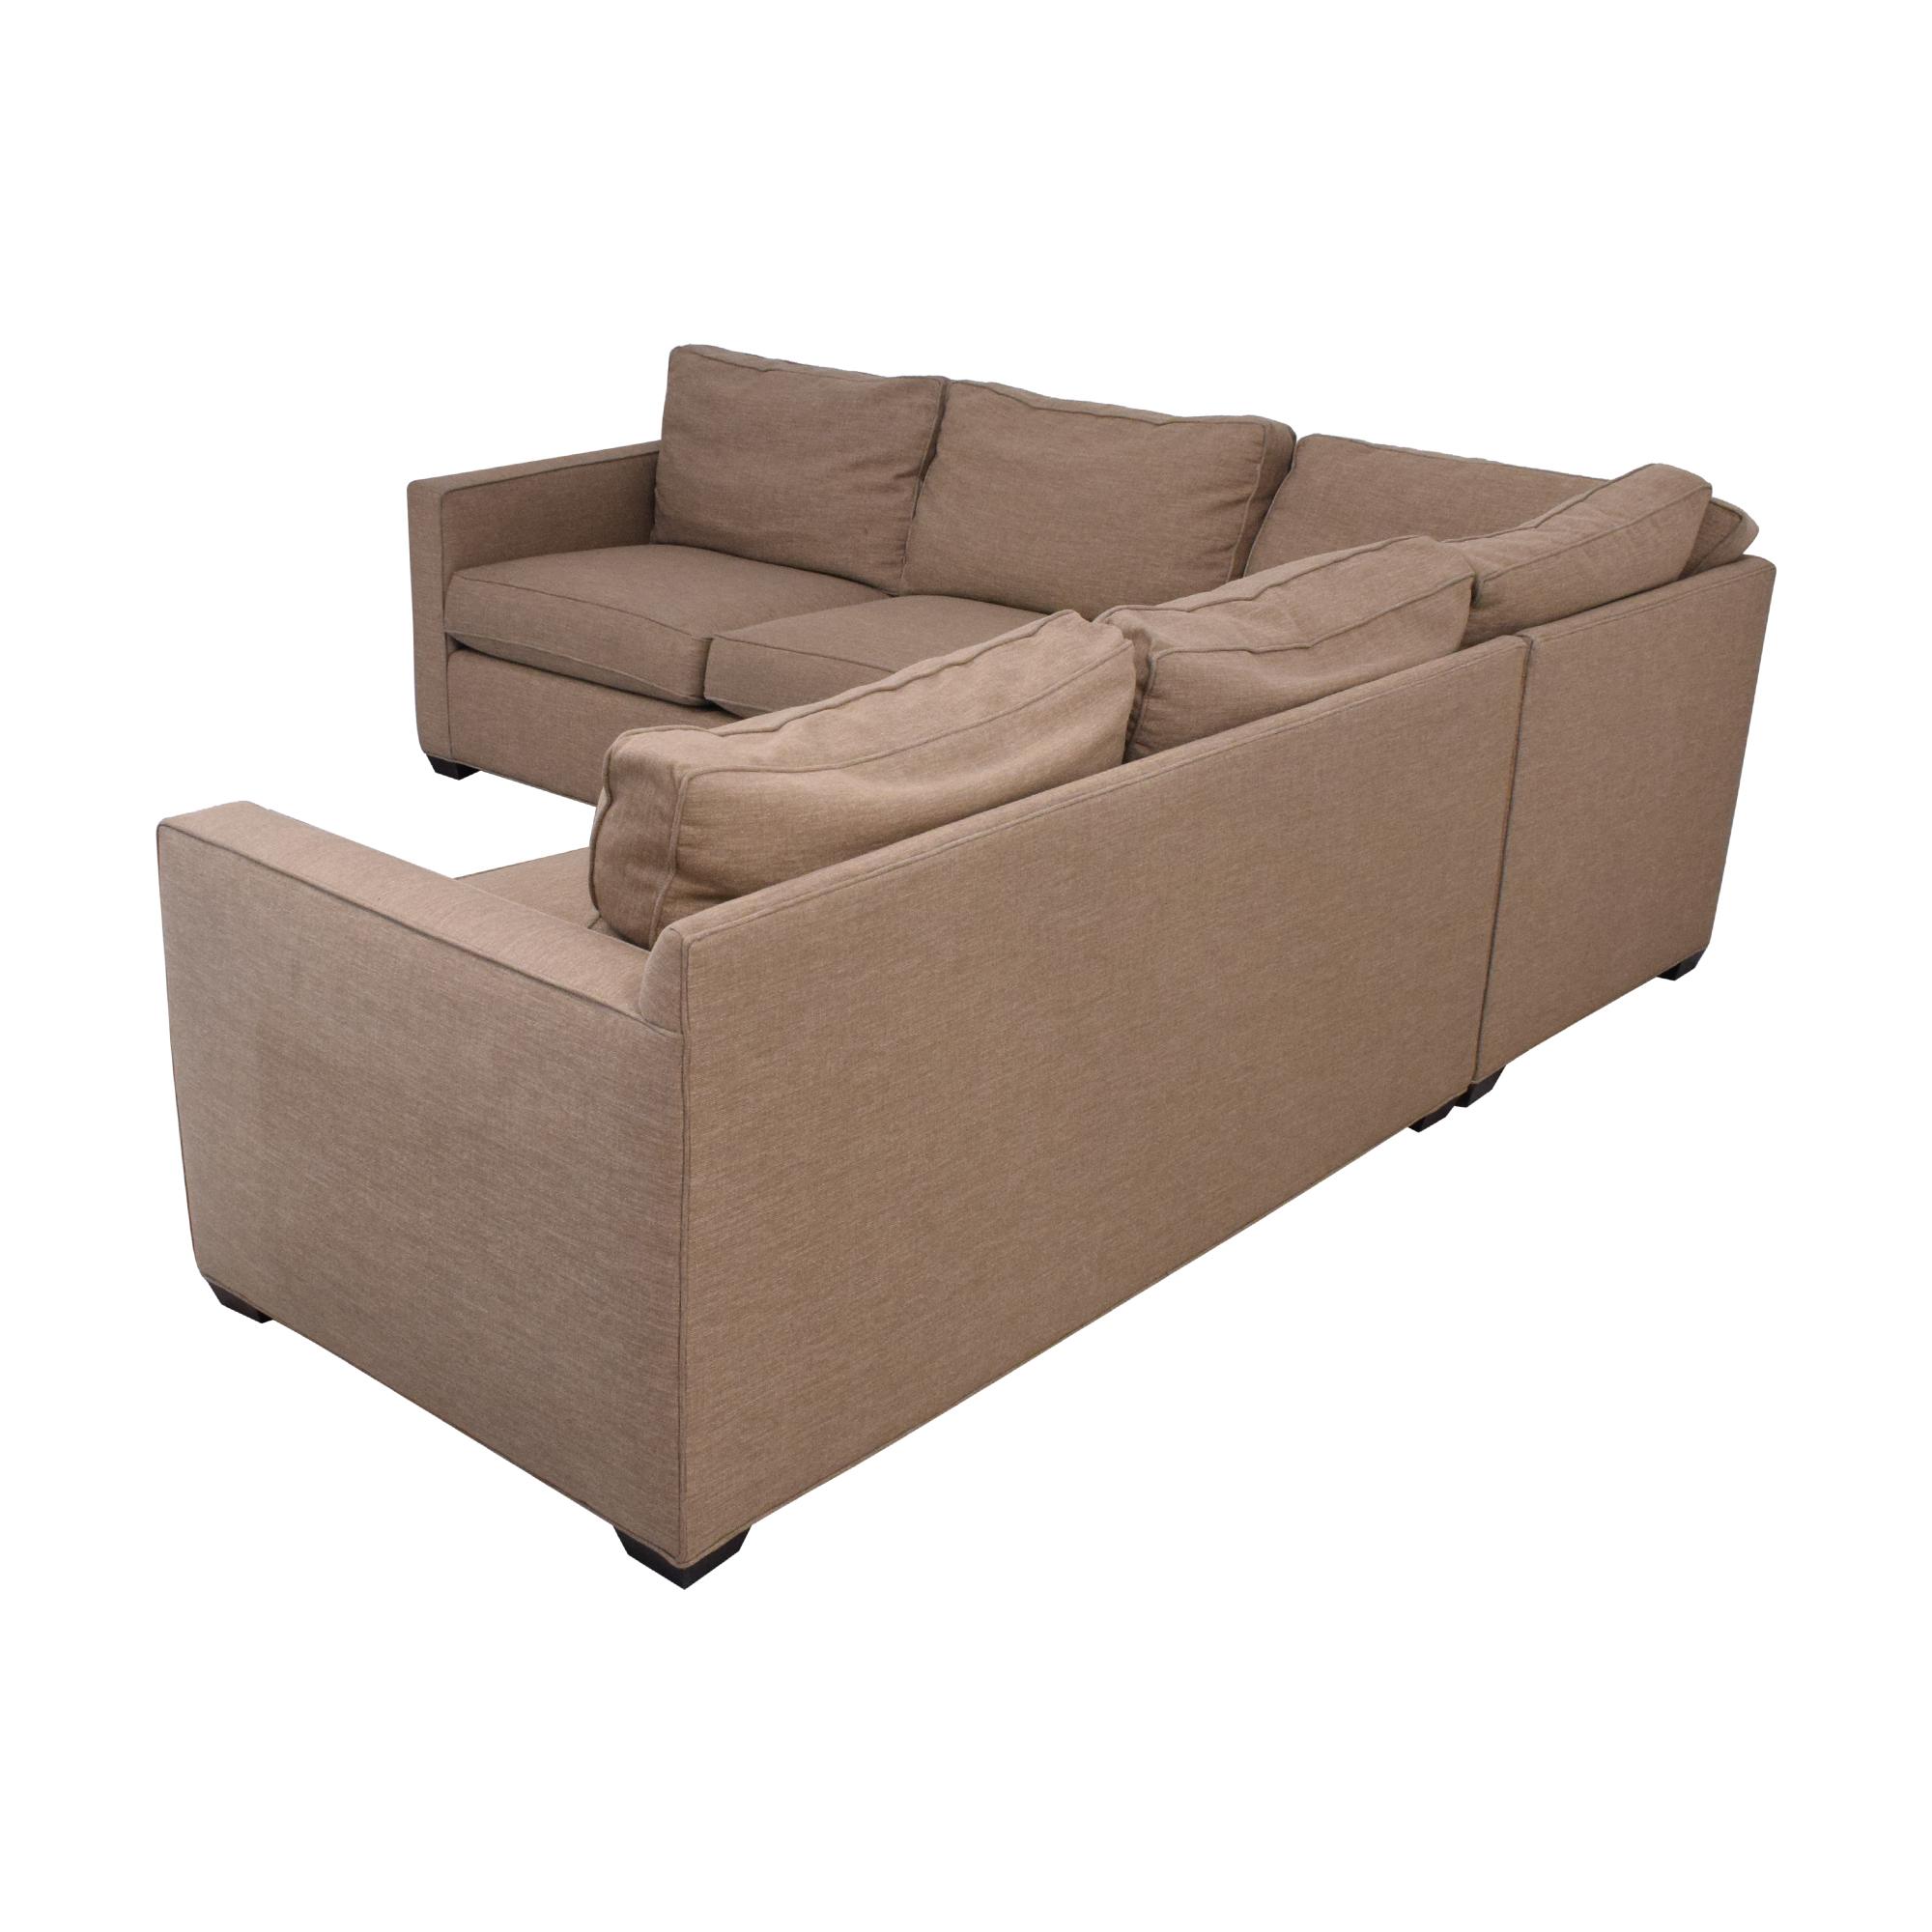 Crate & Barrel Crate & Barrel Davis Sectional Sofa for sale